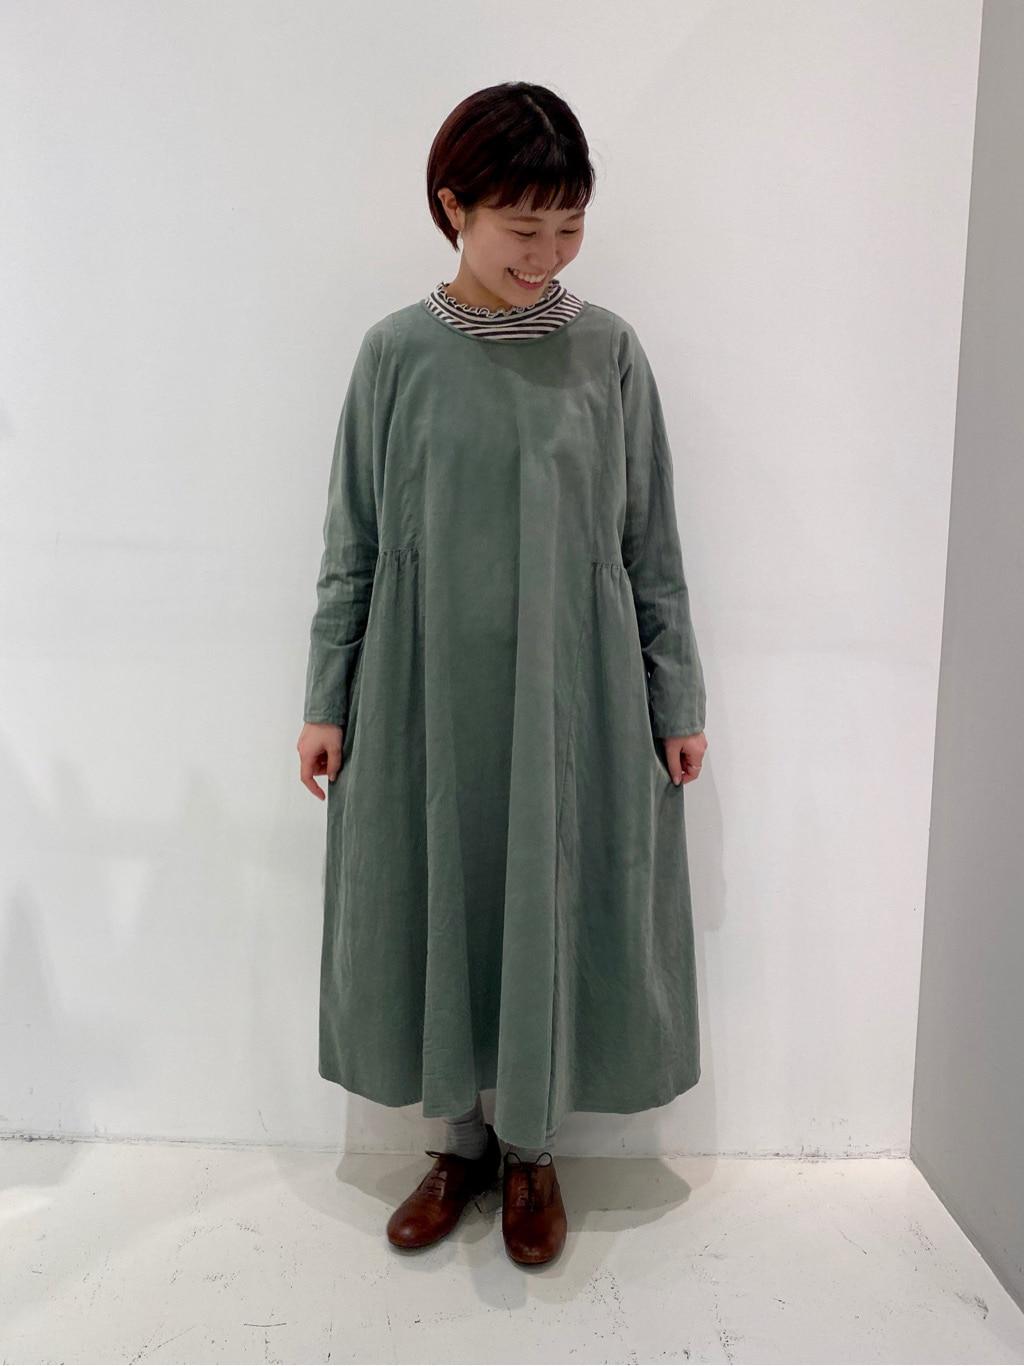 bulle de savon なんばシティ 身長:149cm 2020.12.08